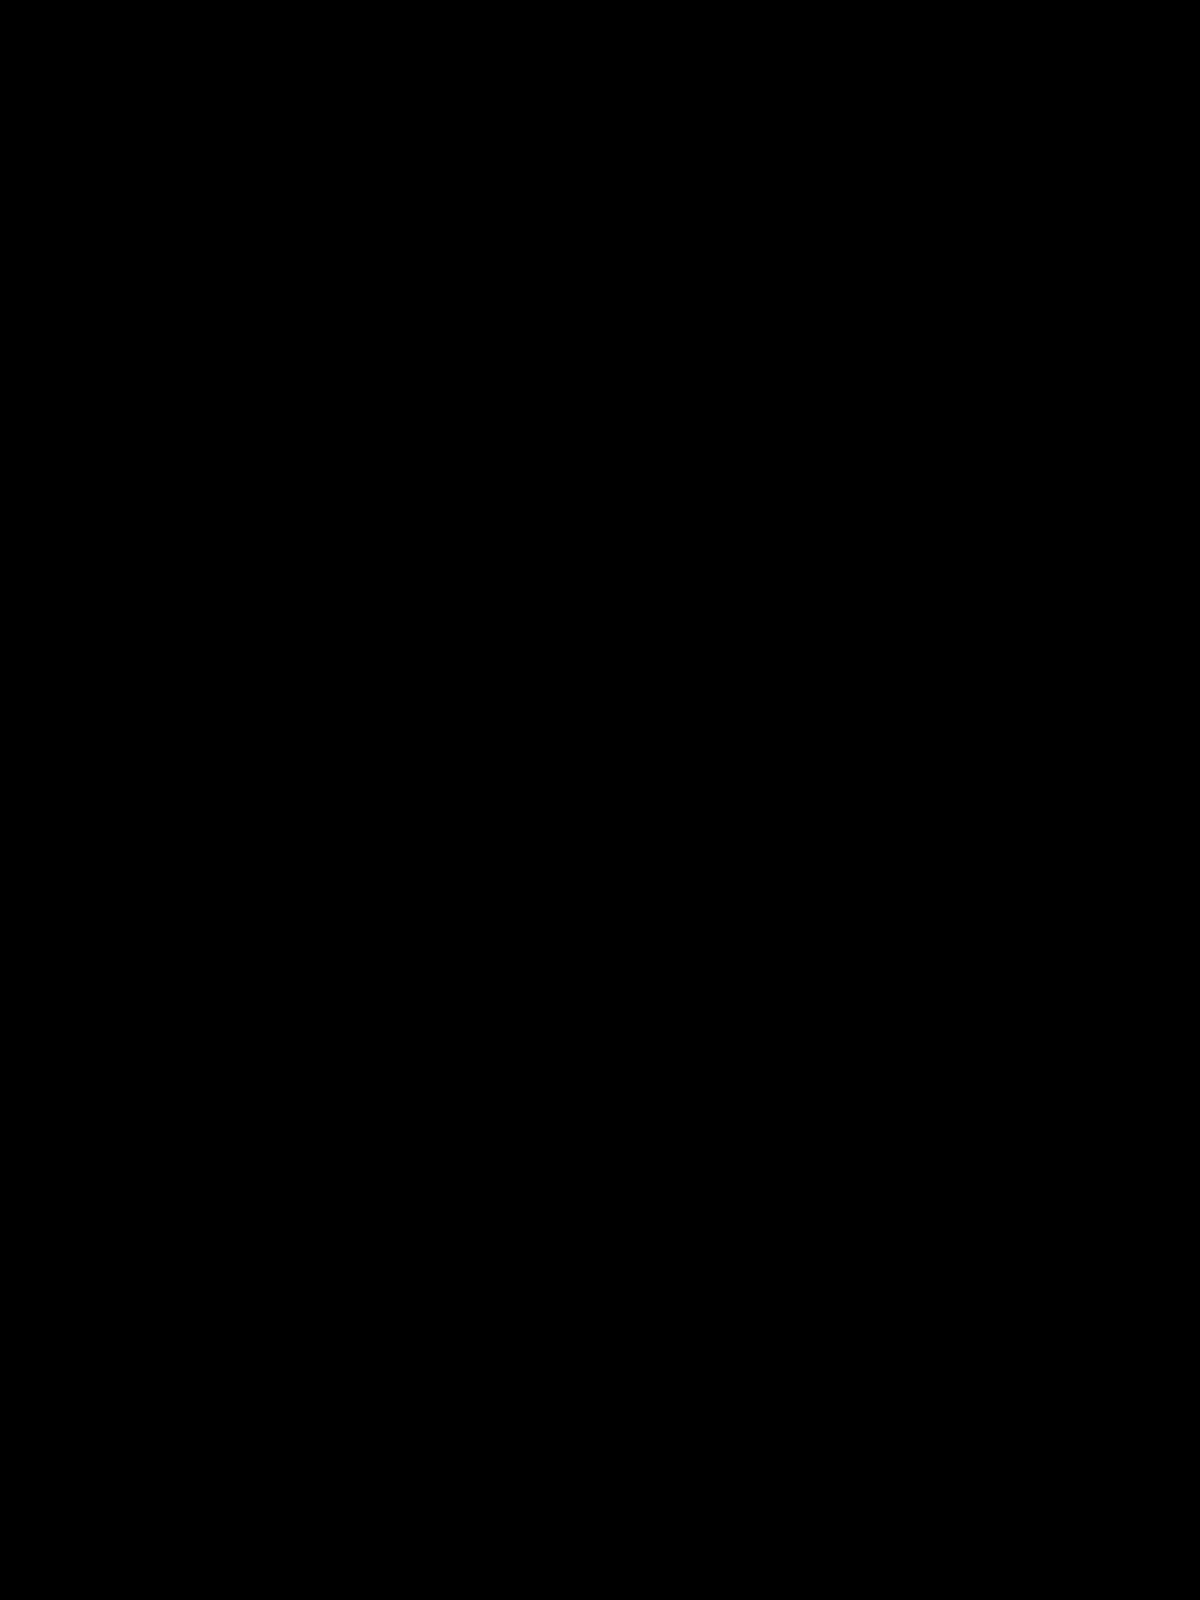 Luis Miguel Vende Casa Acapulco Papa Jaime Camil furthermore Chris Hemsworth Mostro Foto Desnudo Tom Hiddleston Tomo Esposa Elsa Pataky furthermore Sofia Castro Enciende Instagram Con Ardiente Bikini Cuerpo Espectaculos furthermore Jude Law Lists In Londons Maida Vale 1201234922 together with Richard Anderson Dead Six Million Dollar Man. on oscar austin facebook